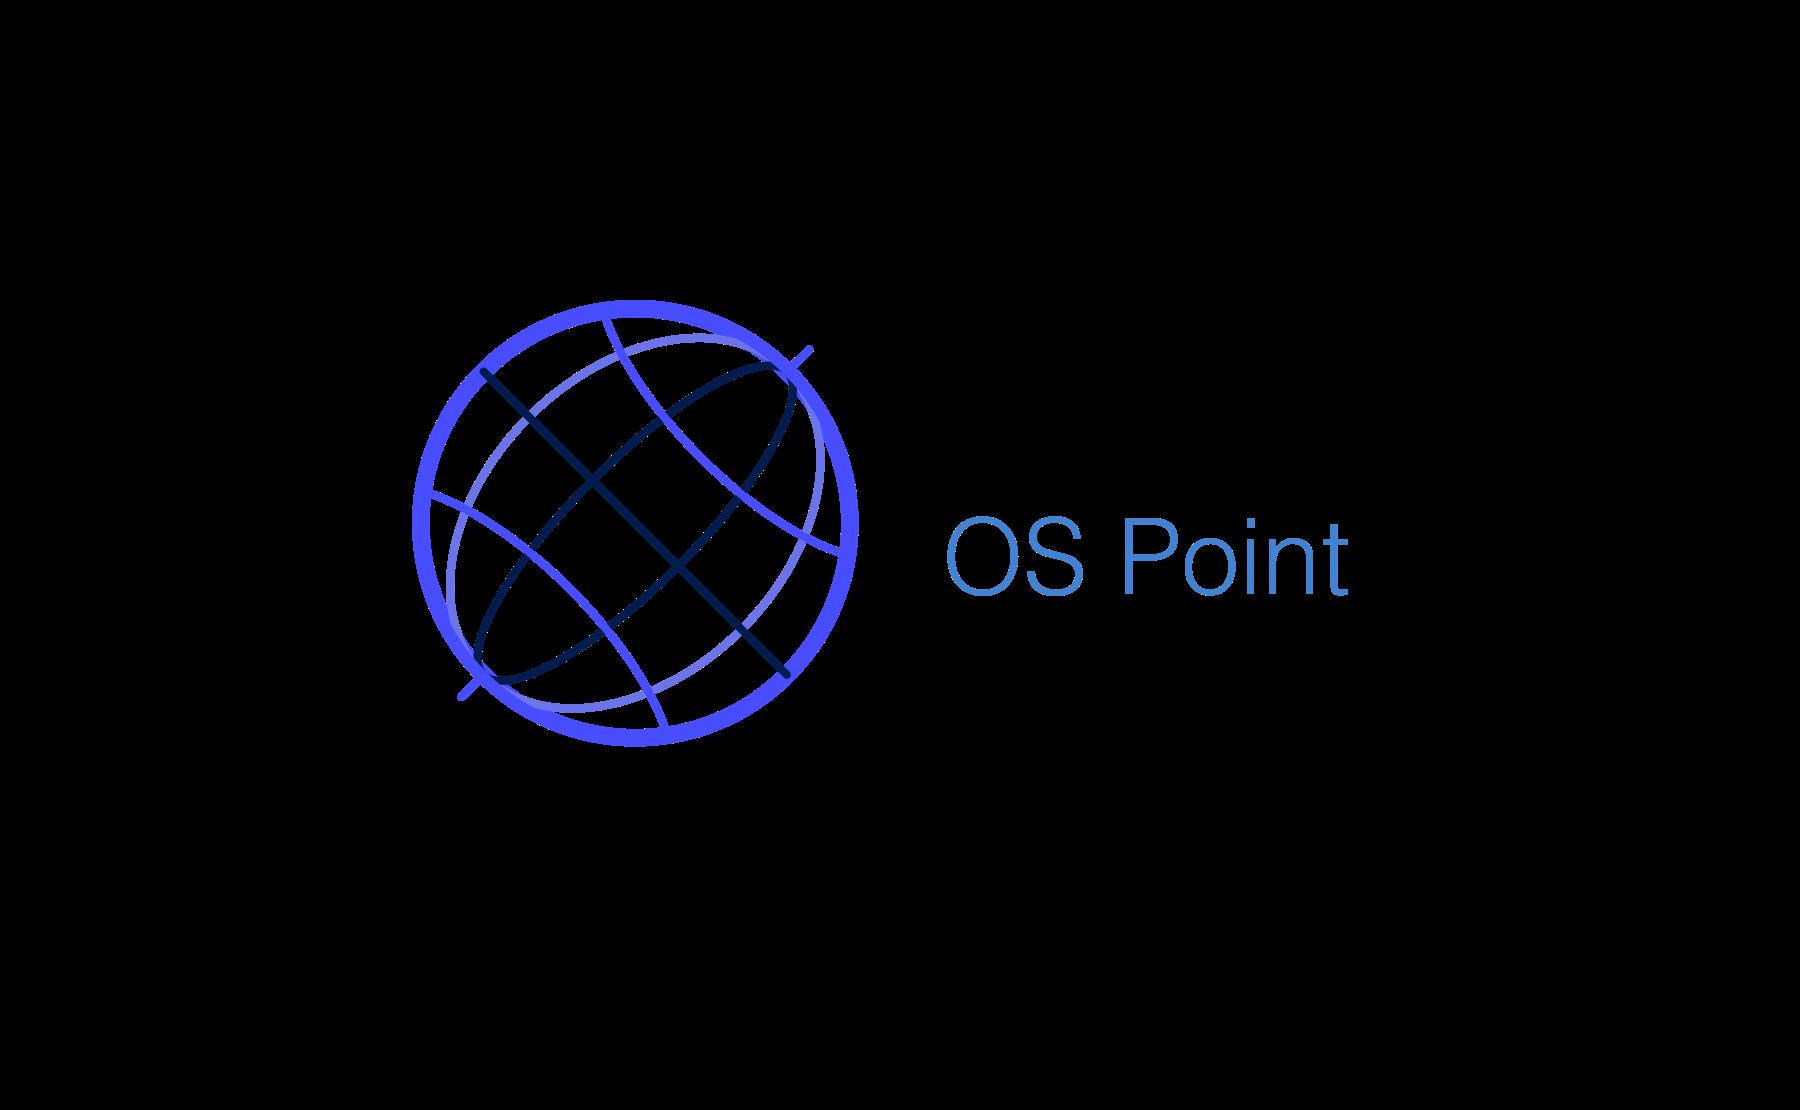 OSPoint